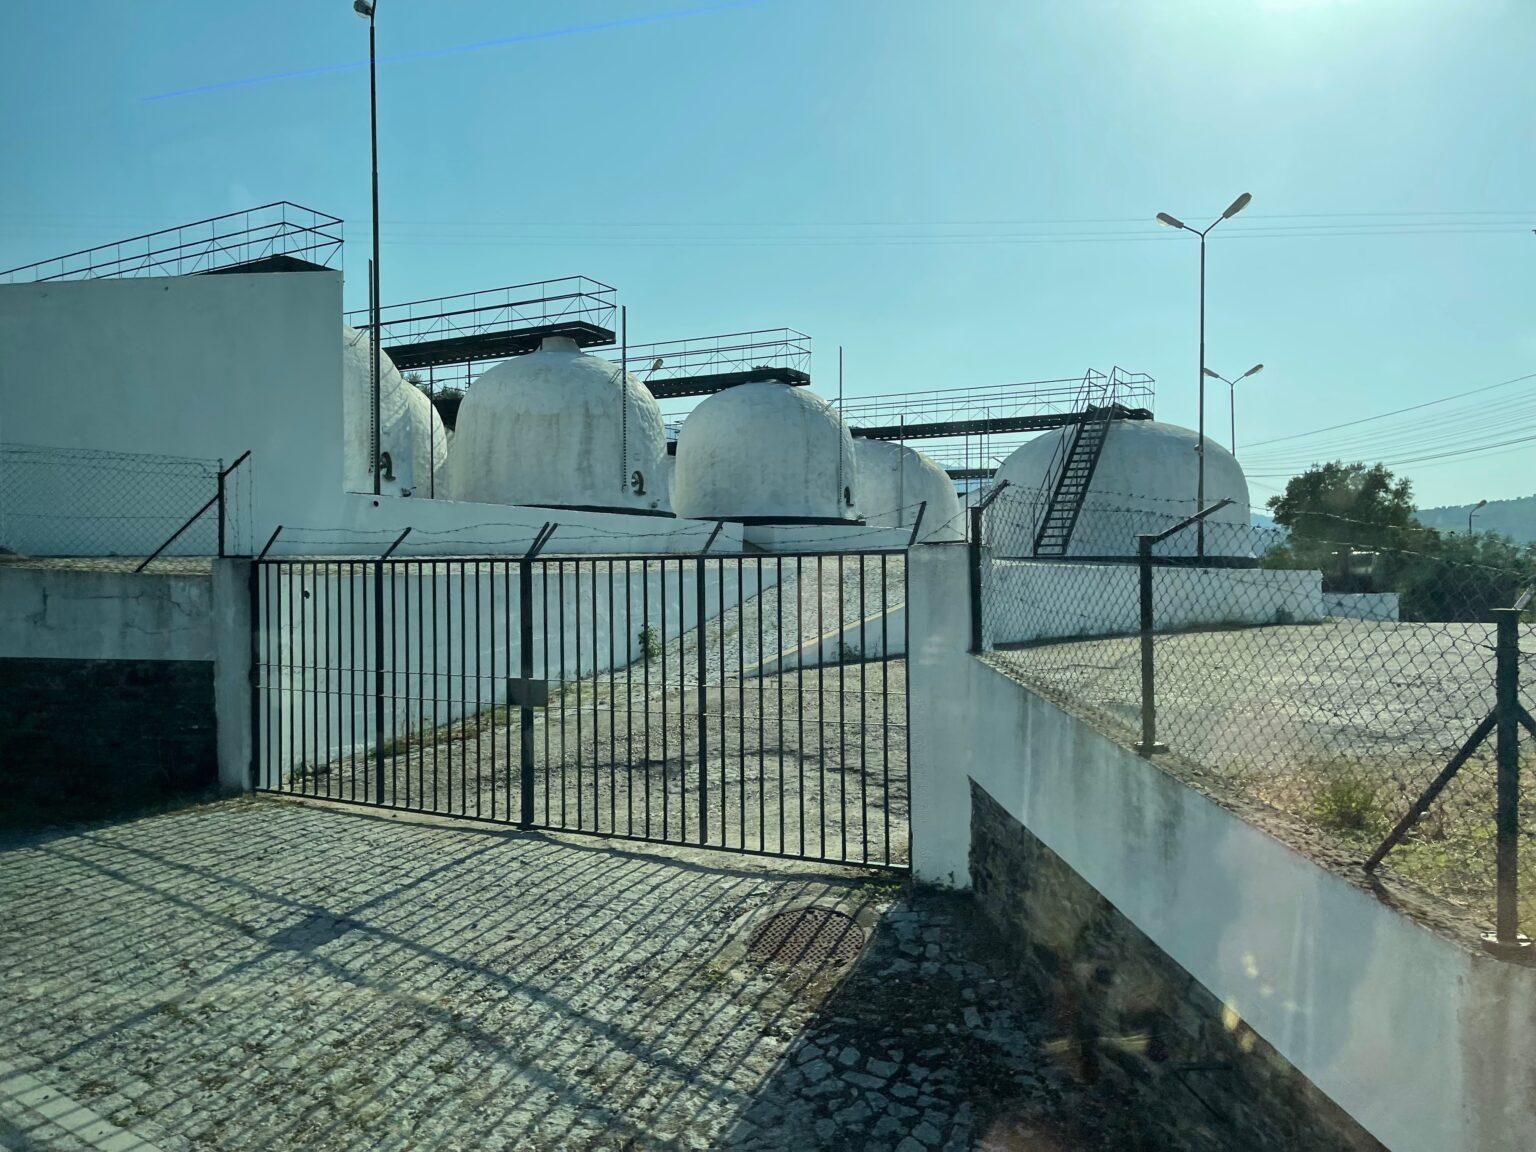 Port fermenting tanks in Portugal